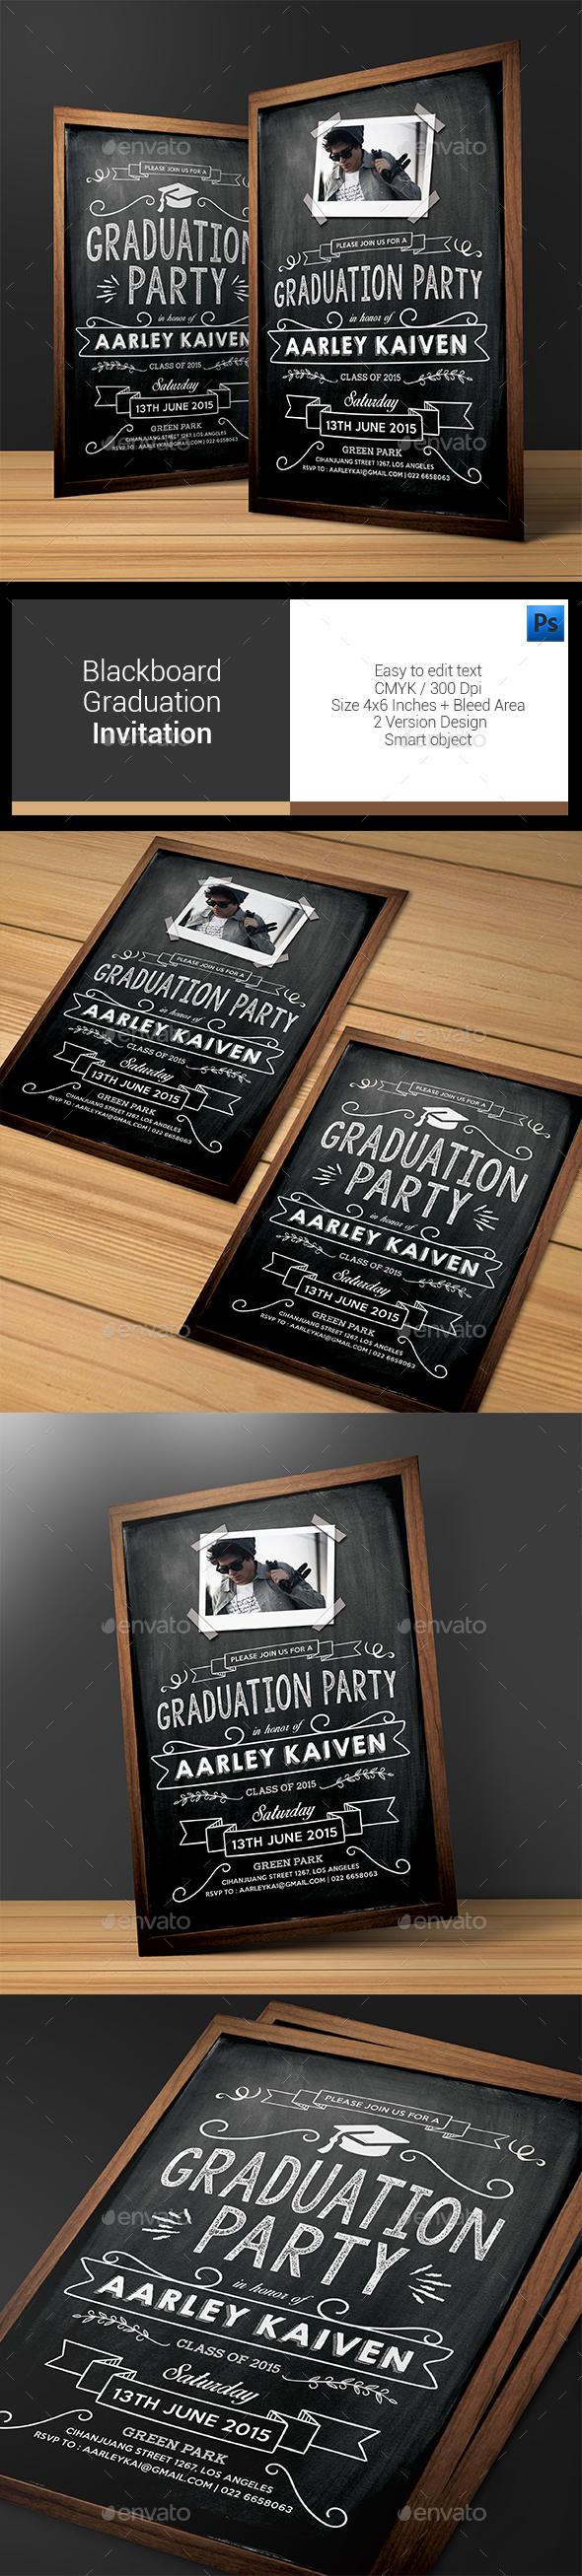 Blackboard Graduation Invitation - Invitations Cards & Invites